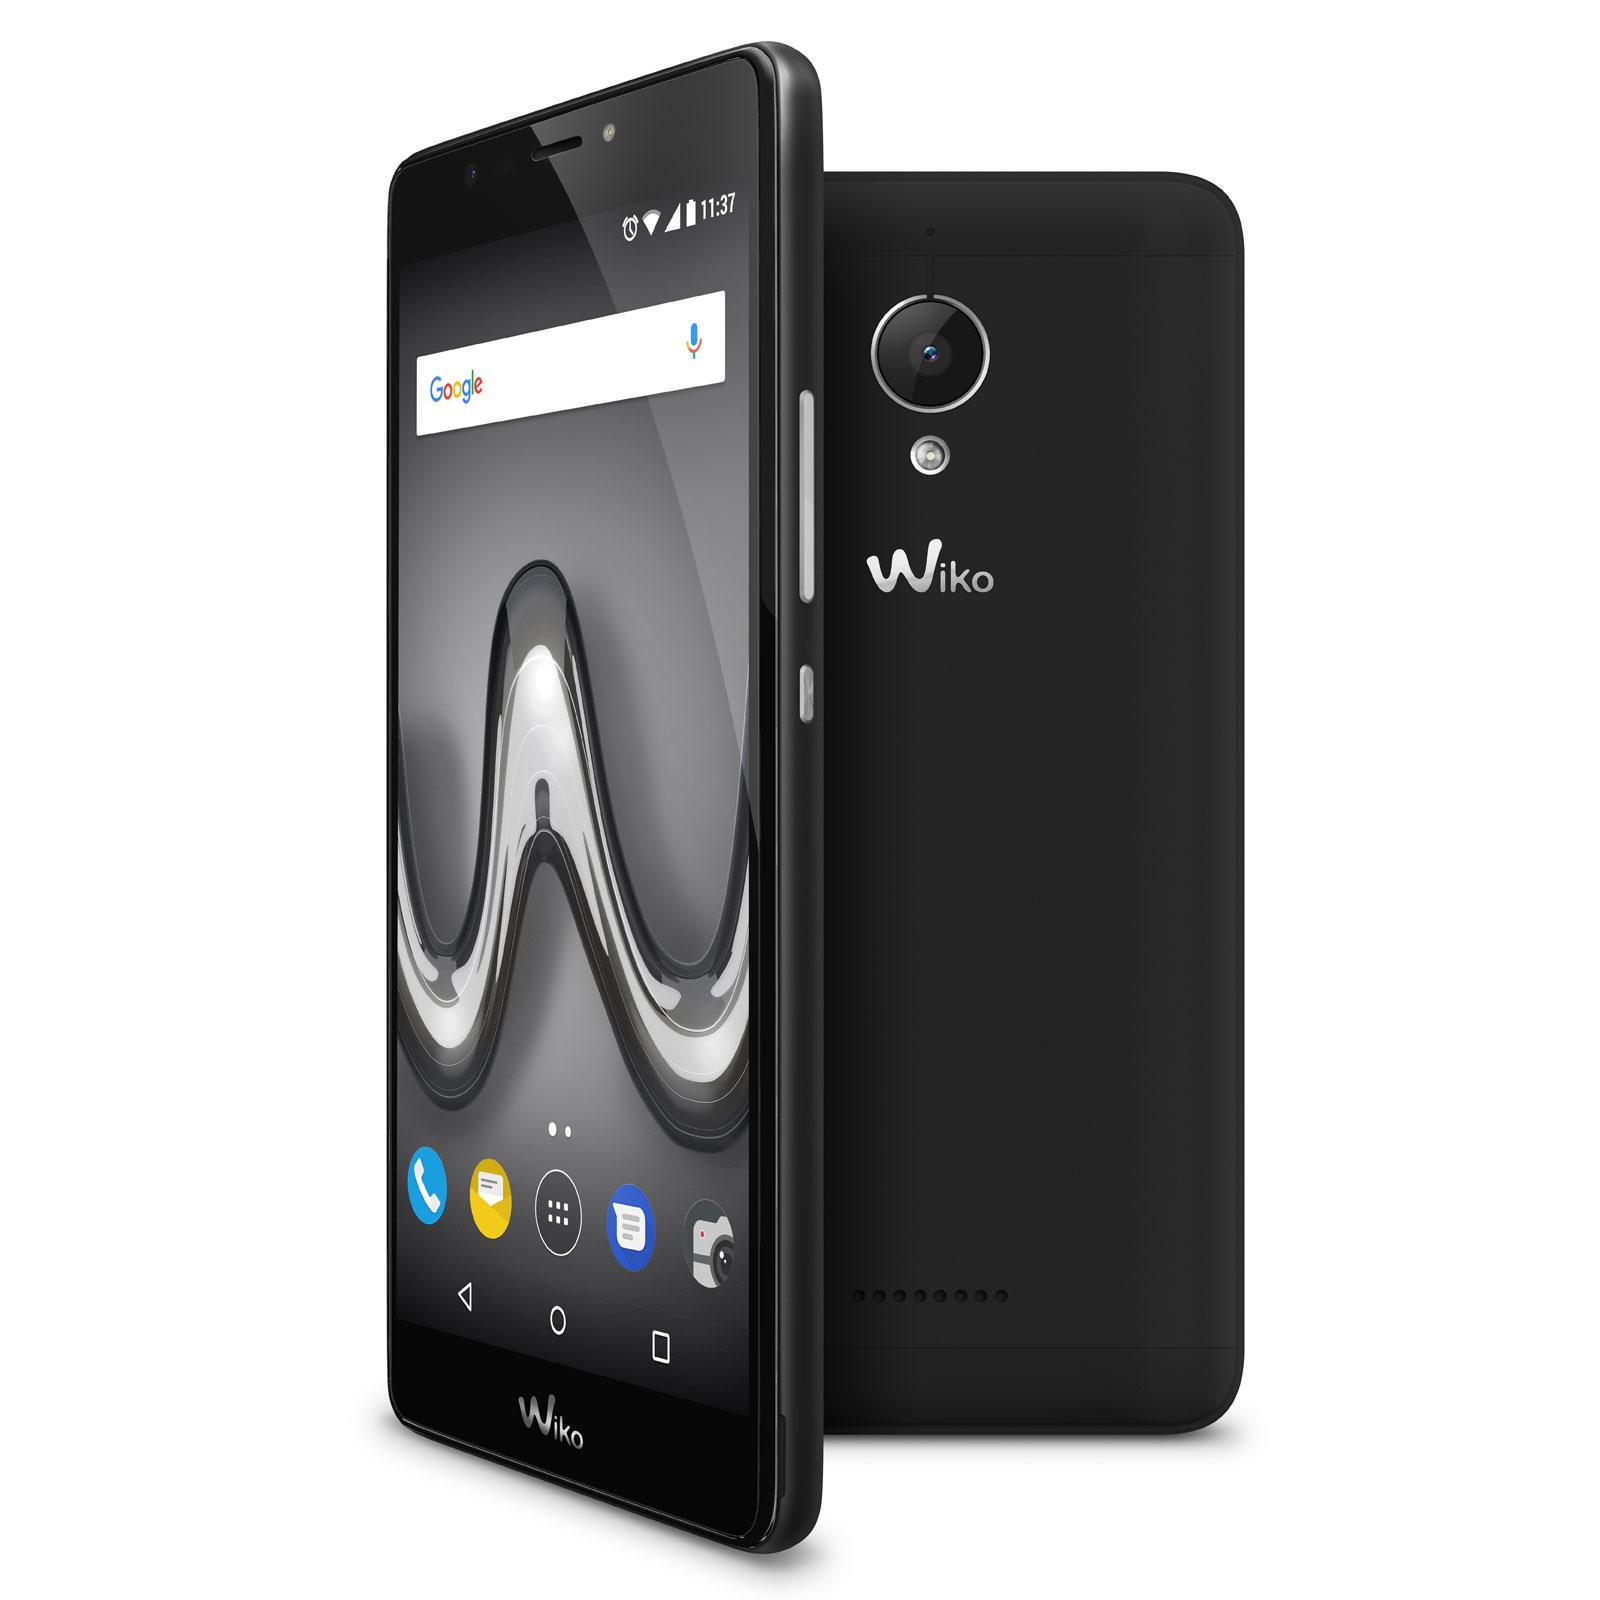 wiko tommy 2 plus noir mobile smartphone wiko sur. Black Bedroom Furniture Sets. Home Design Ideas